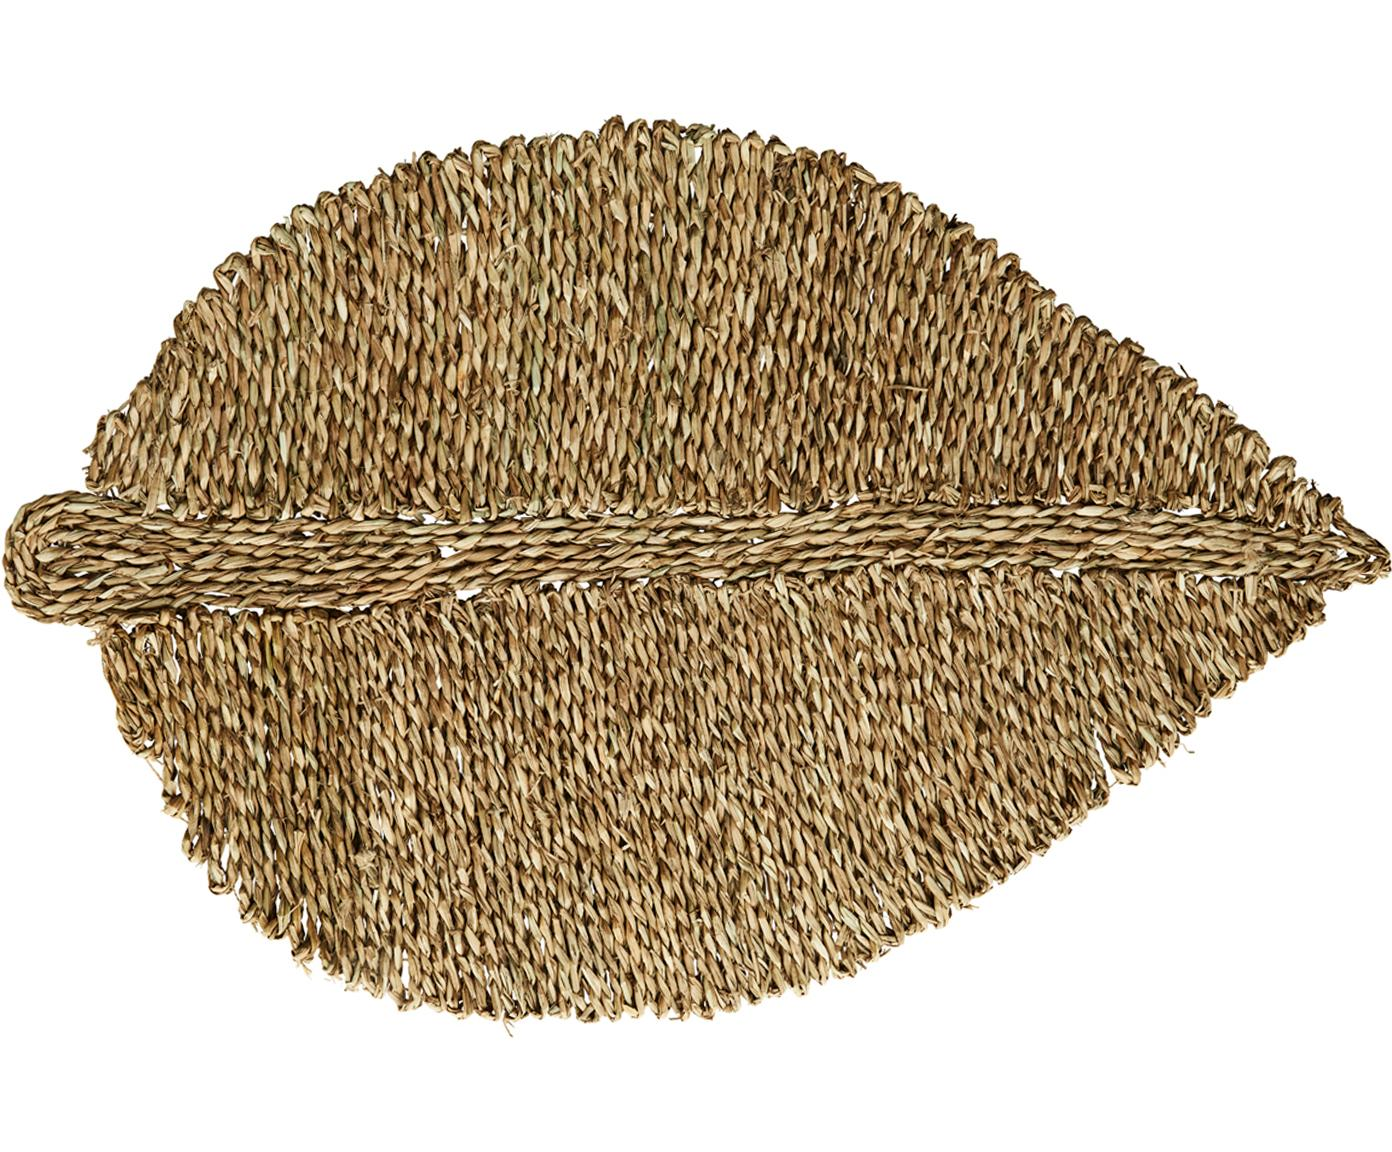 Felpudo de seagrass Leaflet, Algas marinas, Beige, An 52 x L 80 cm